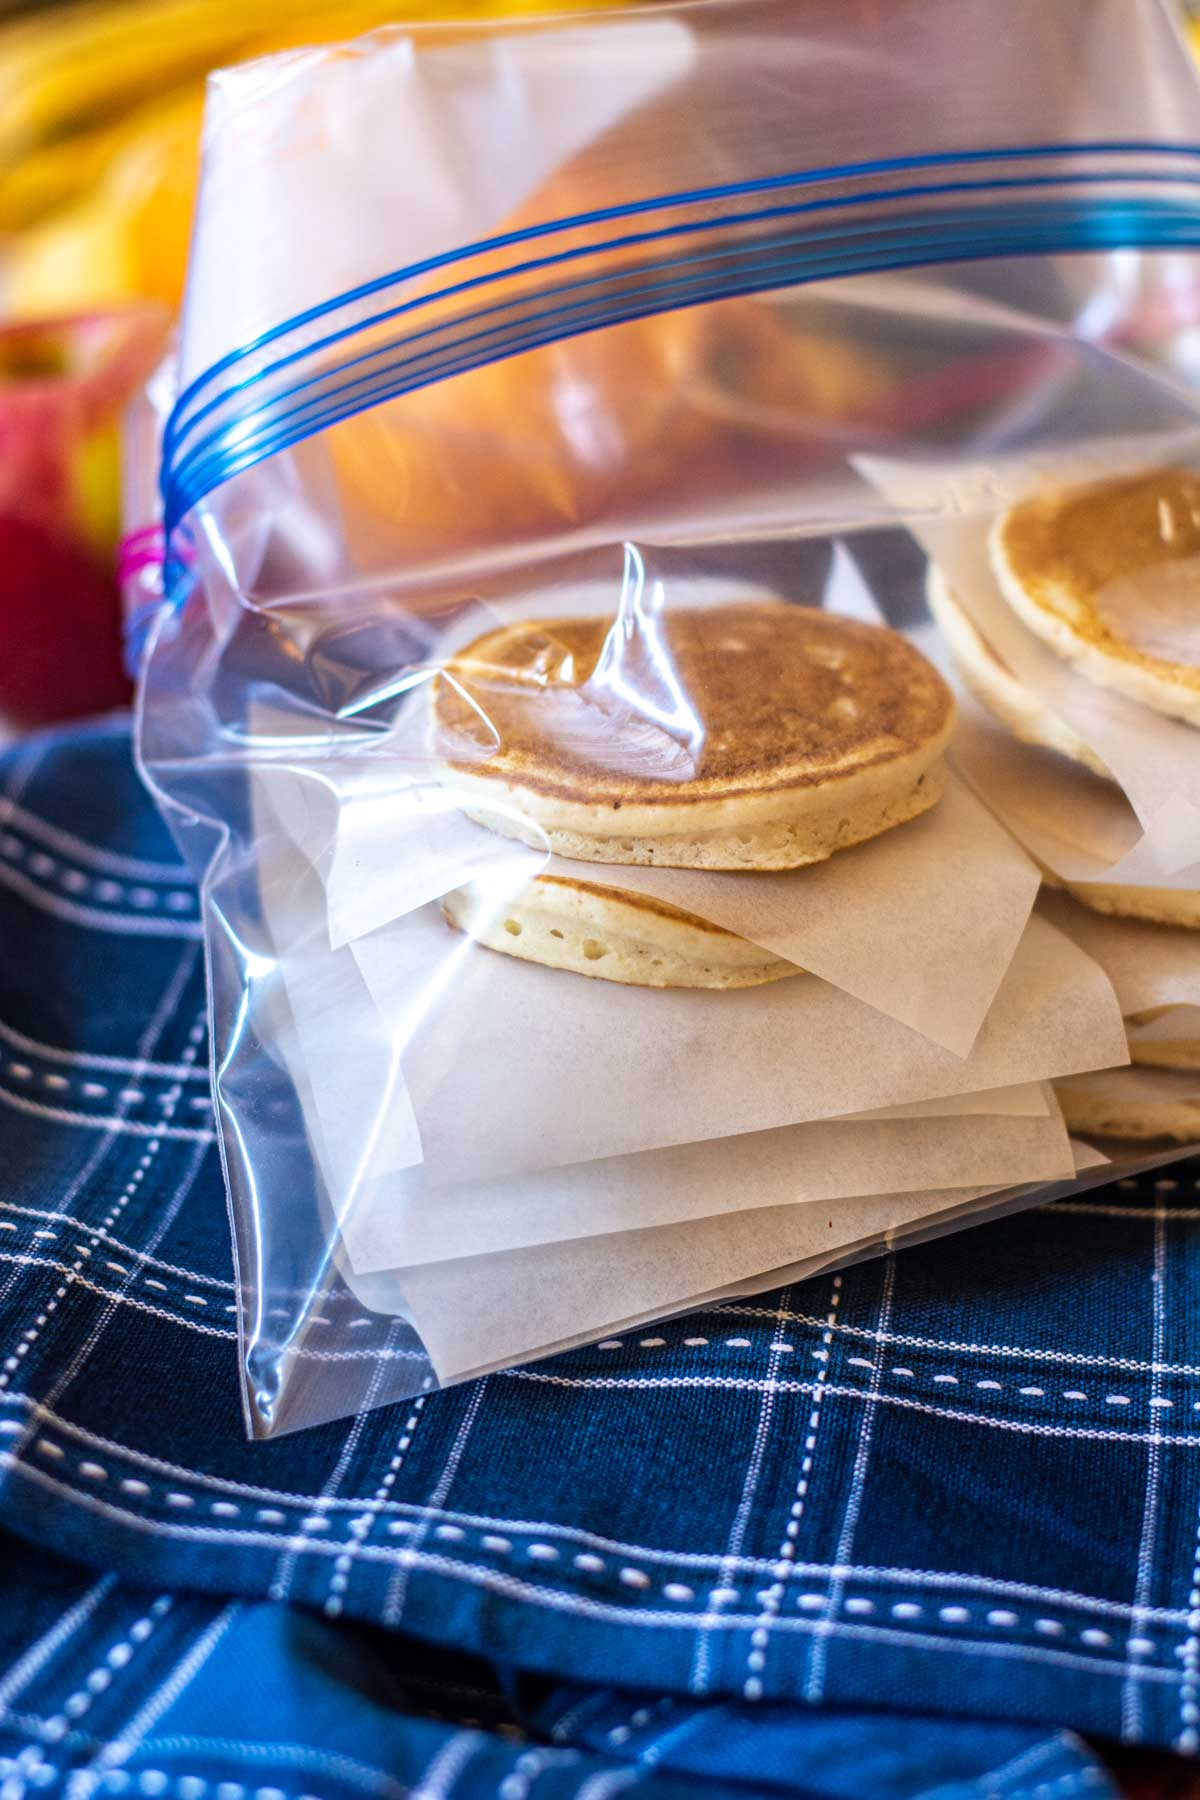 Adding the stacks of pancakes to a freezer safe Ziploc bag.